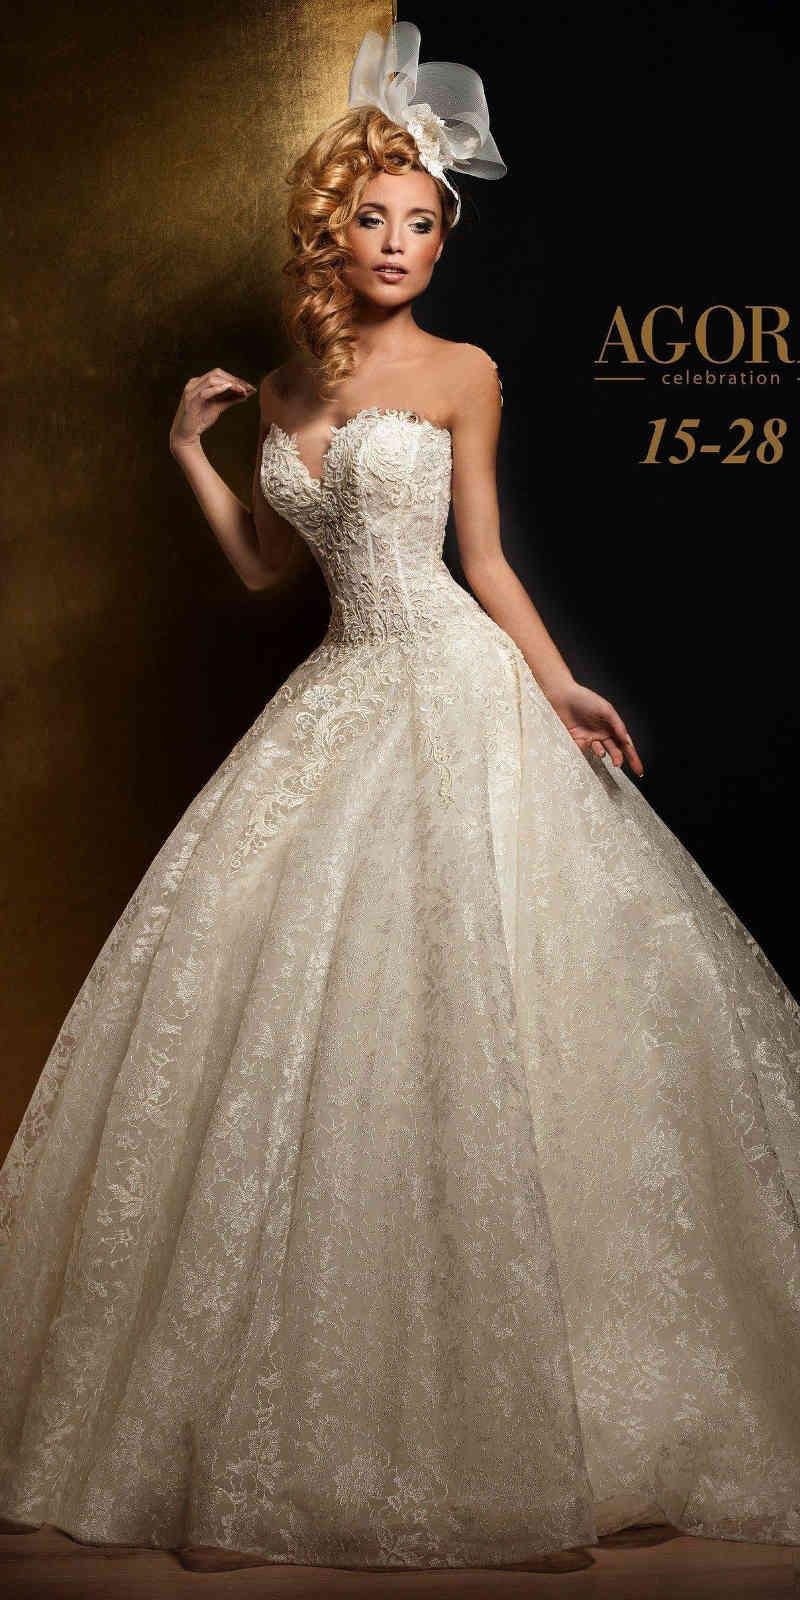 R36 Agora 15 28 Koronkowa Suknia ślubna Princeska 7250651188